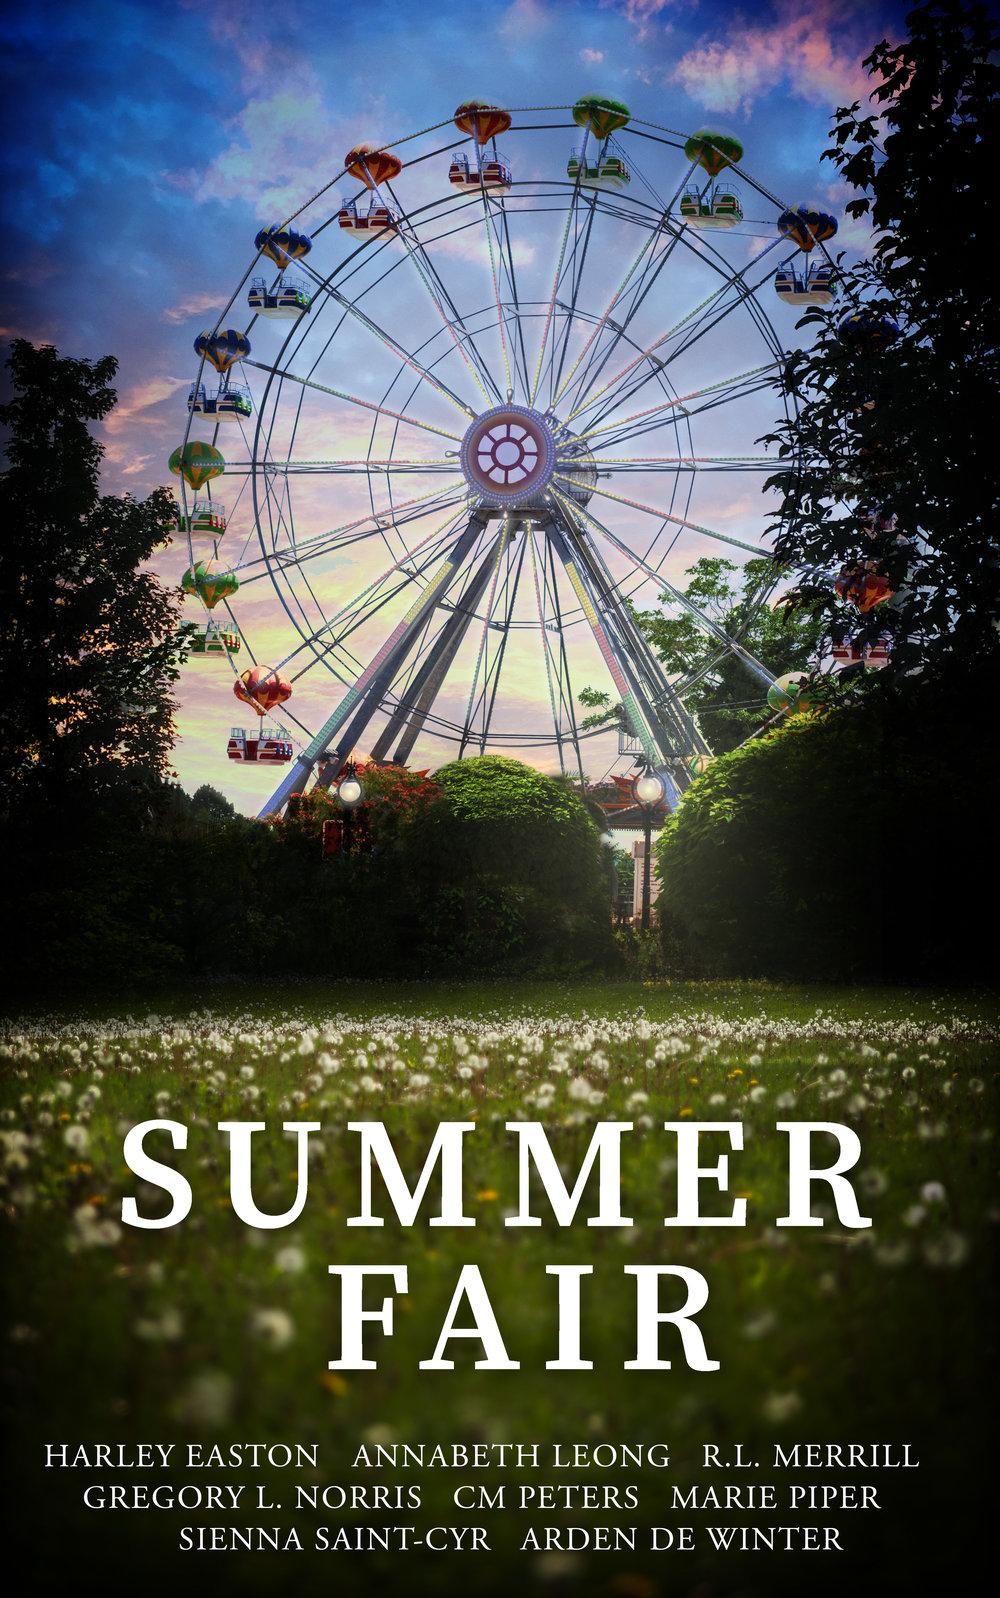 SummerFairFinal.jpg